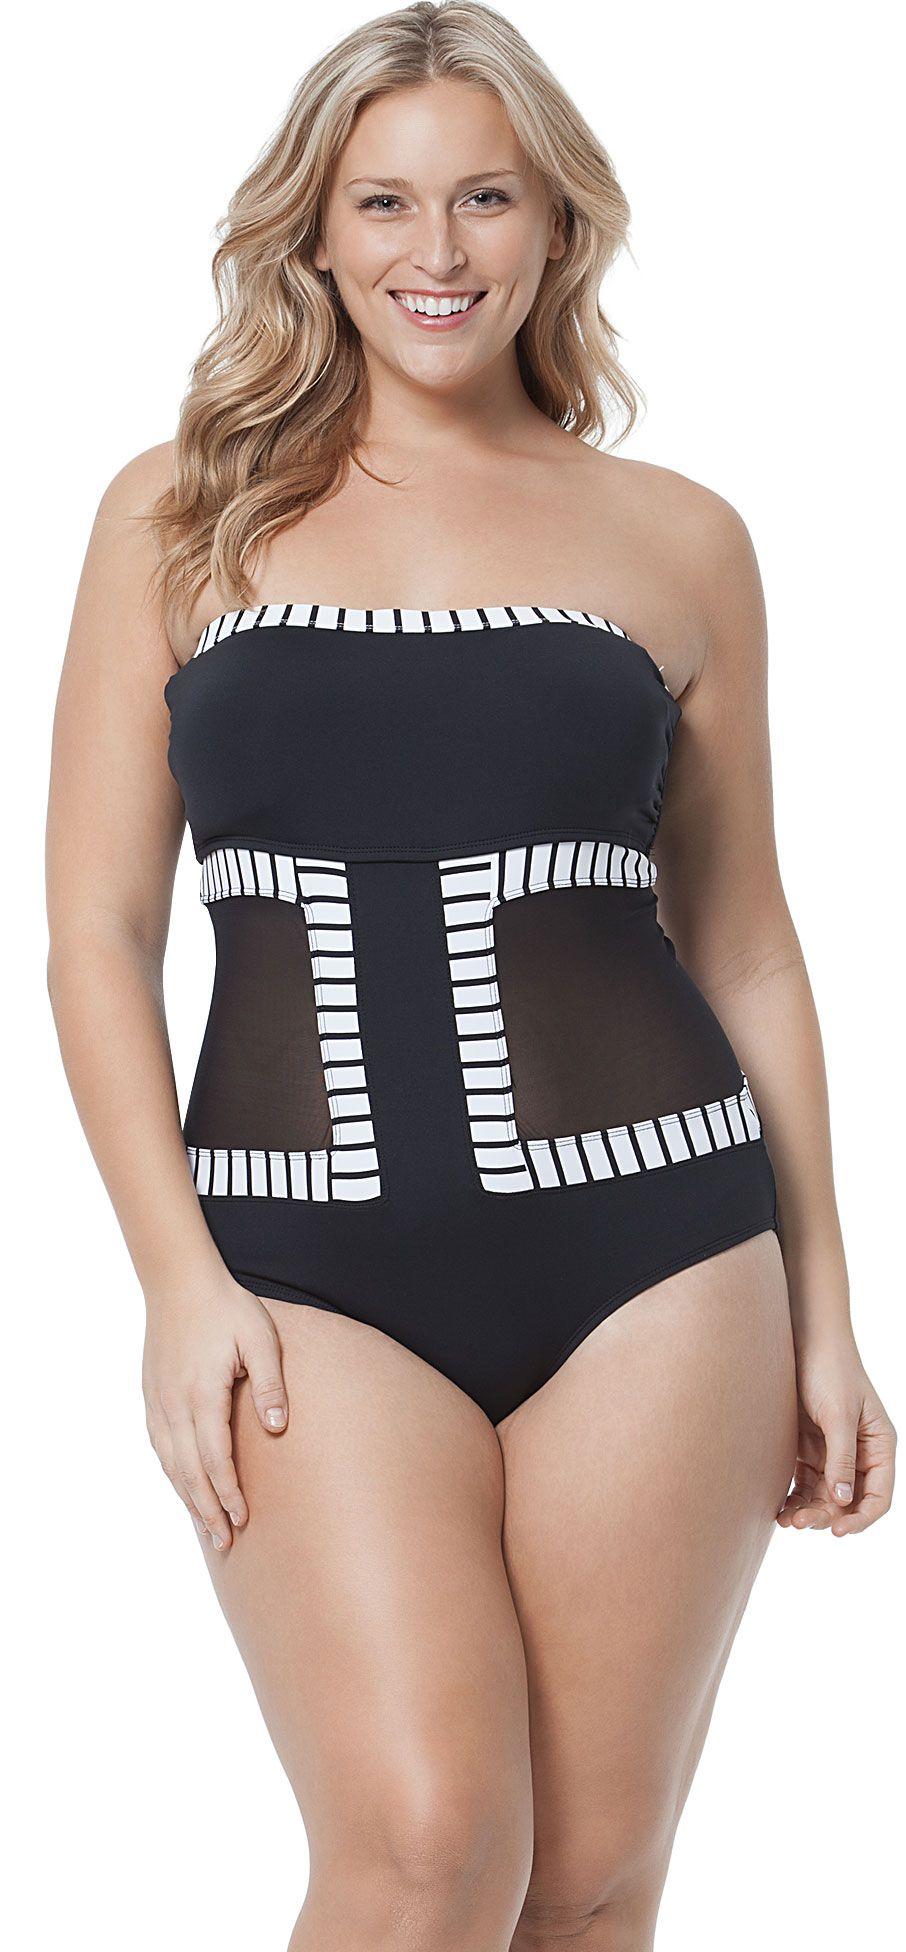 fe47df2ab11 Anne Cole Plus Mesh Bandeau   Plus Size   Plus Size Swimwear 웃☀웃 ...